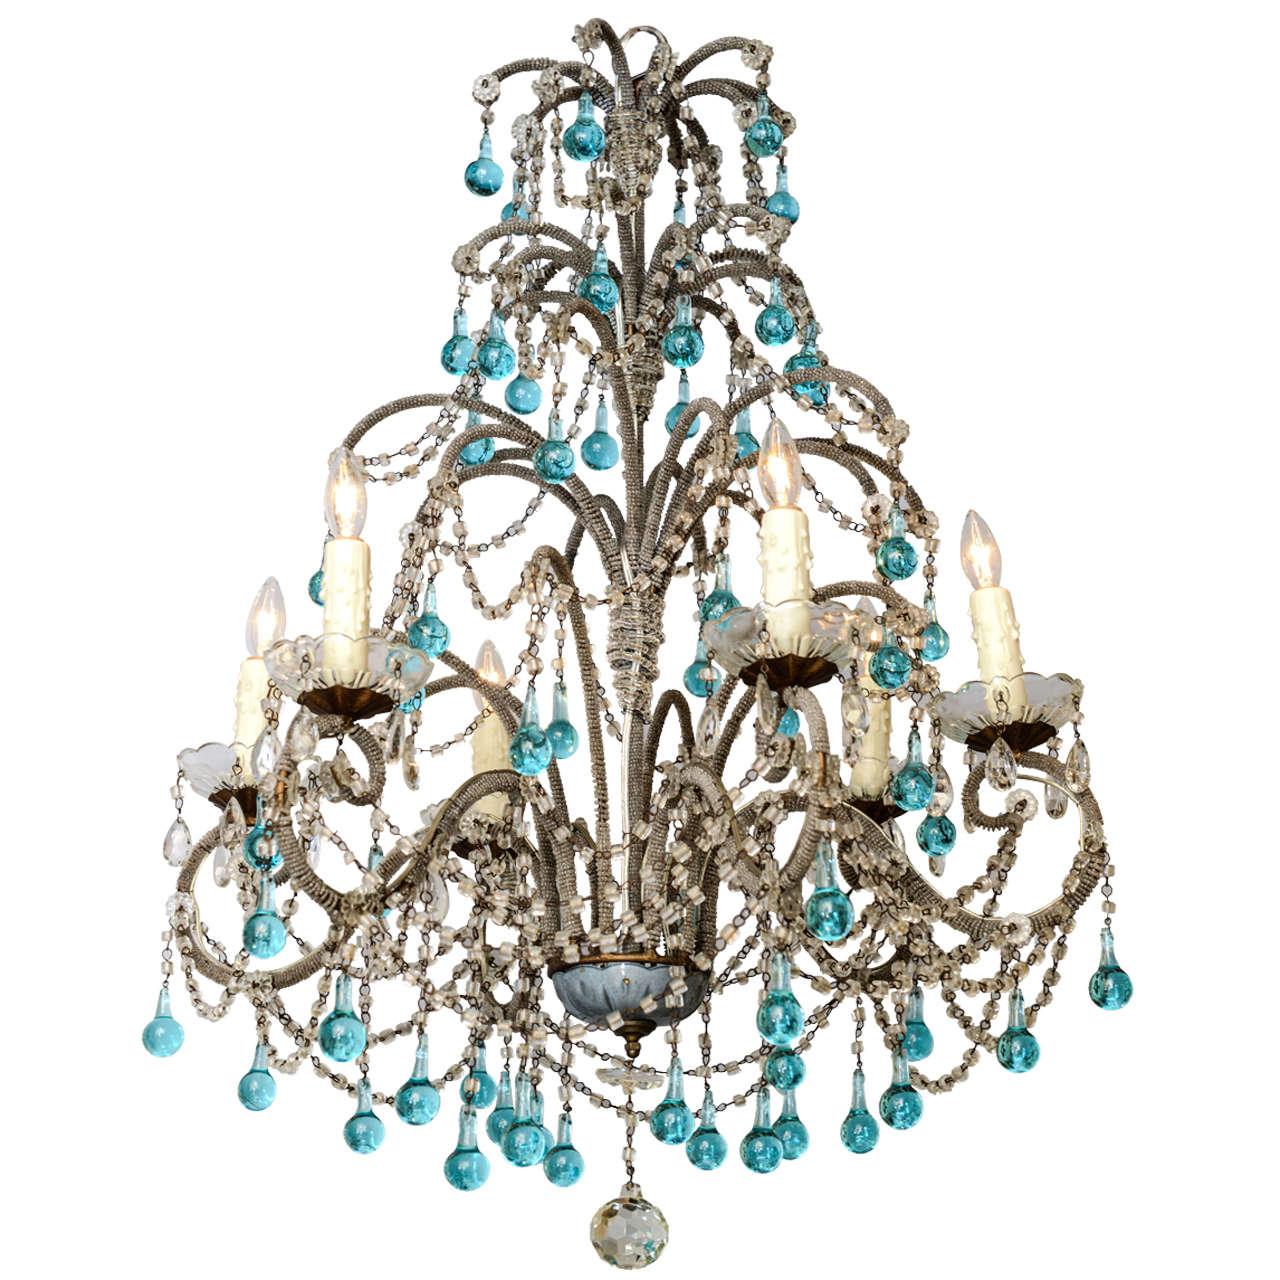 Italian beaded arm six light chandelier with turquoise glass drops italian beaded arm six light chandelier with turquoise glass drops for sale aloadofball Choice Image